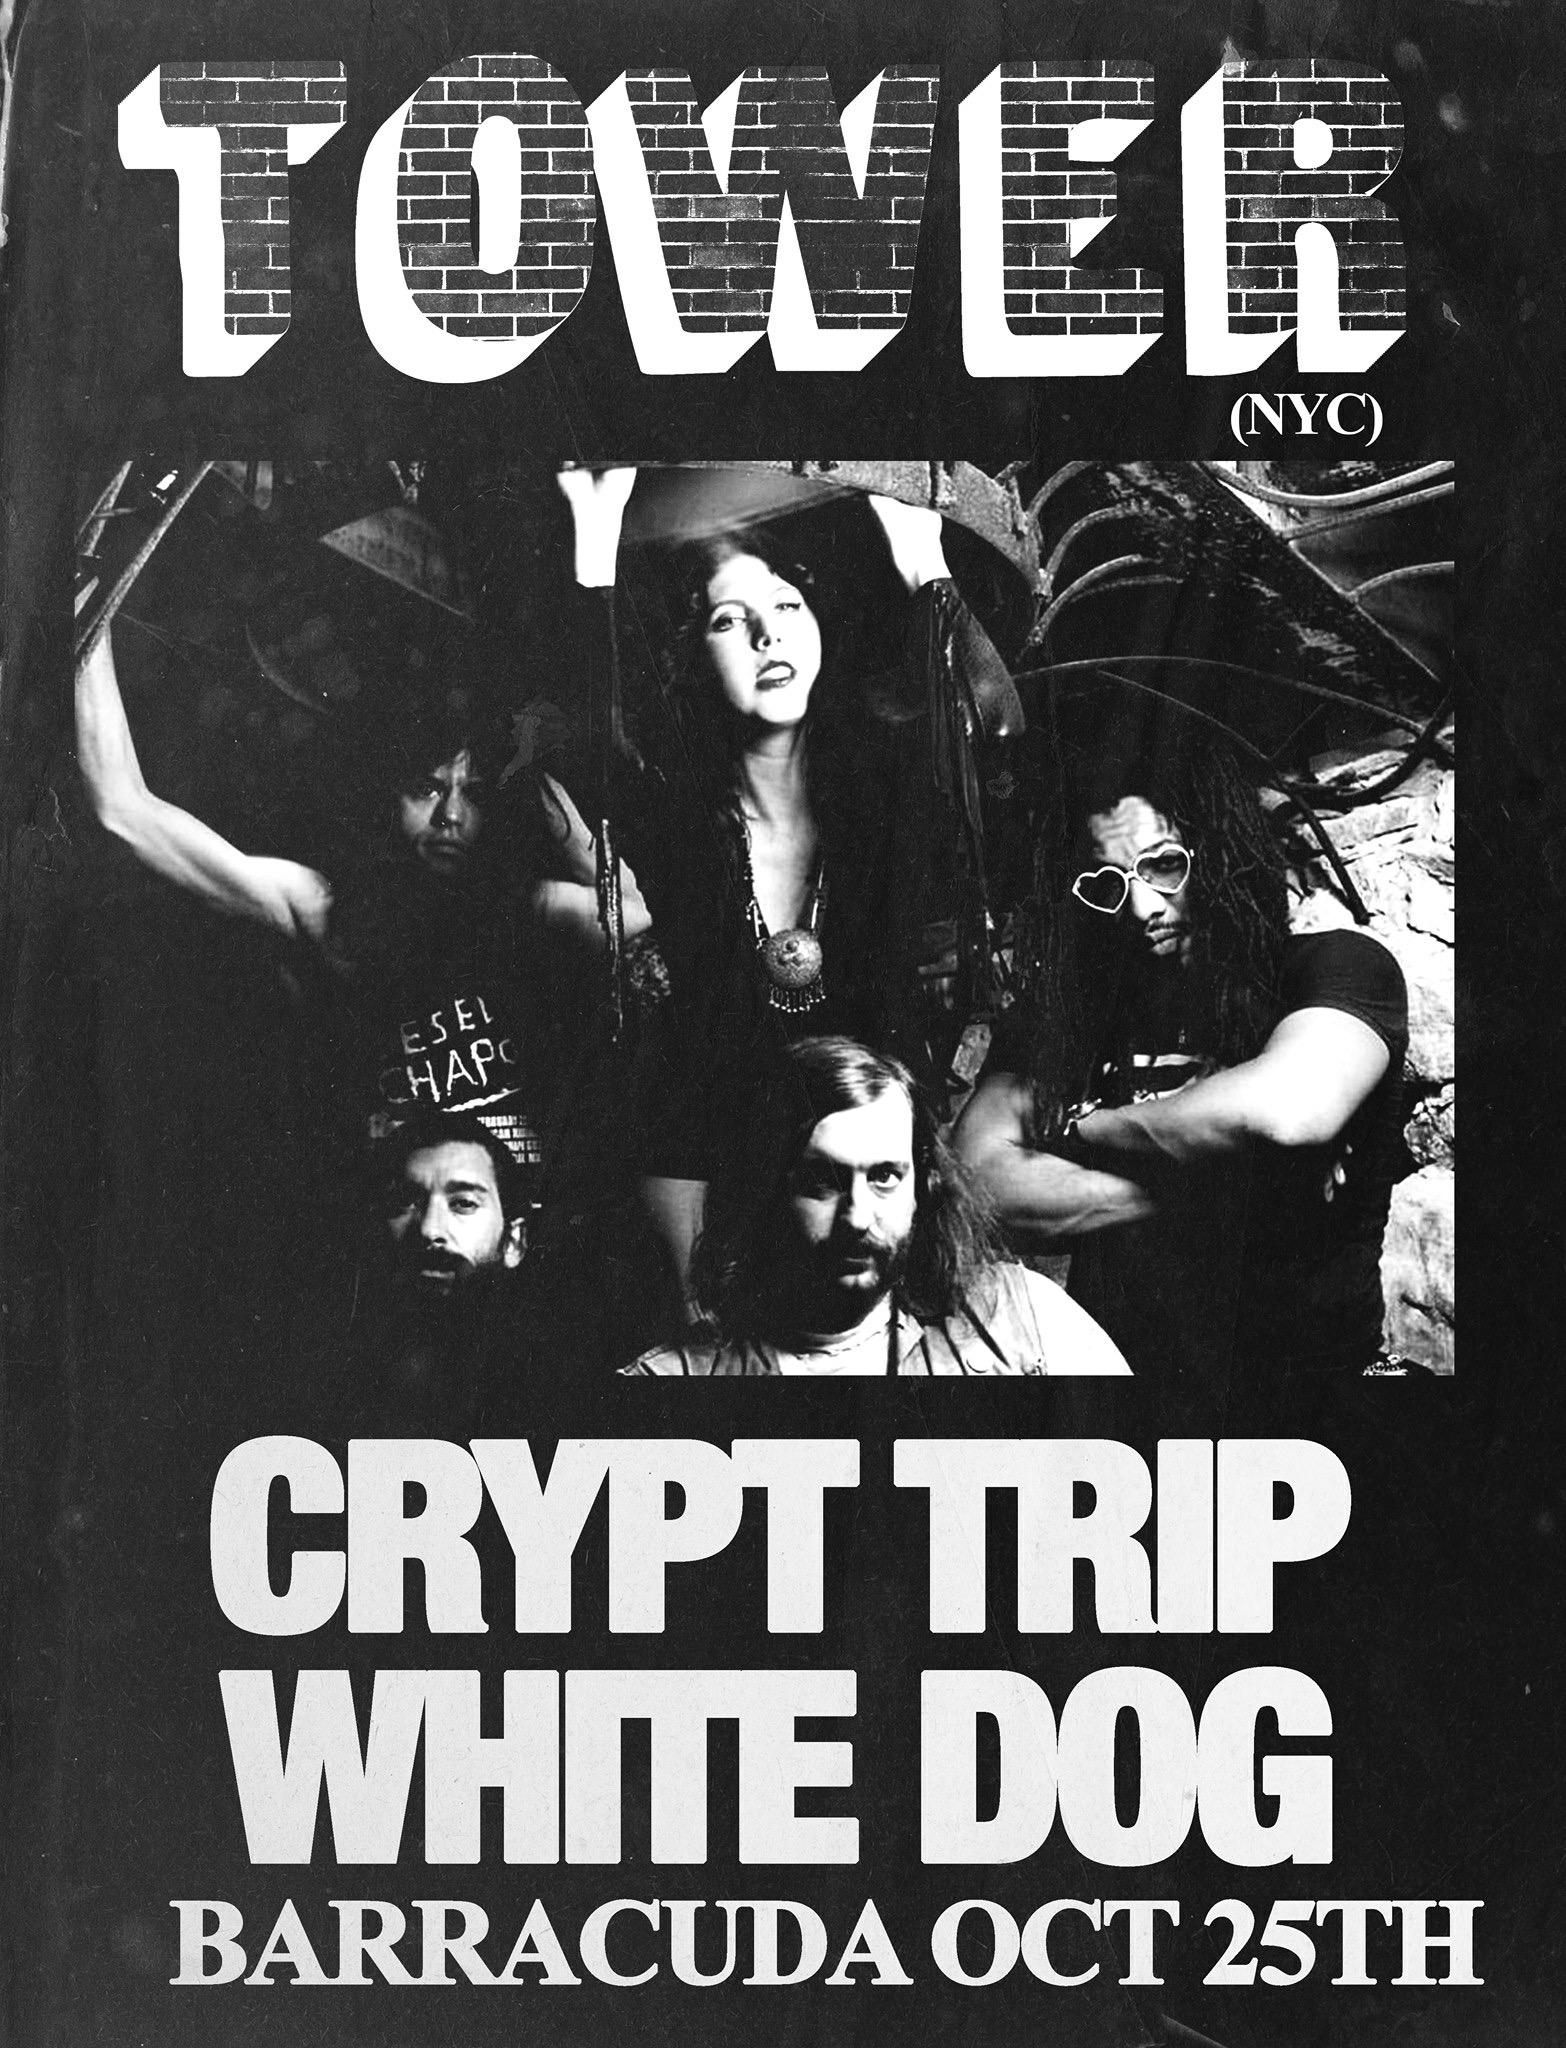 Tower, Crypt Trip, White Dog